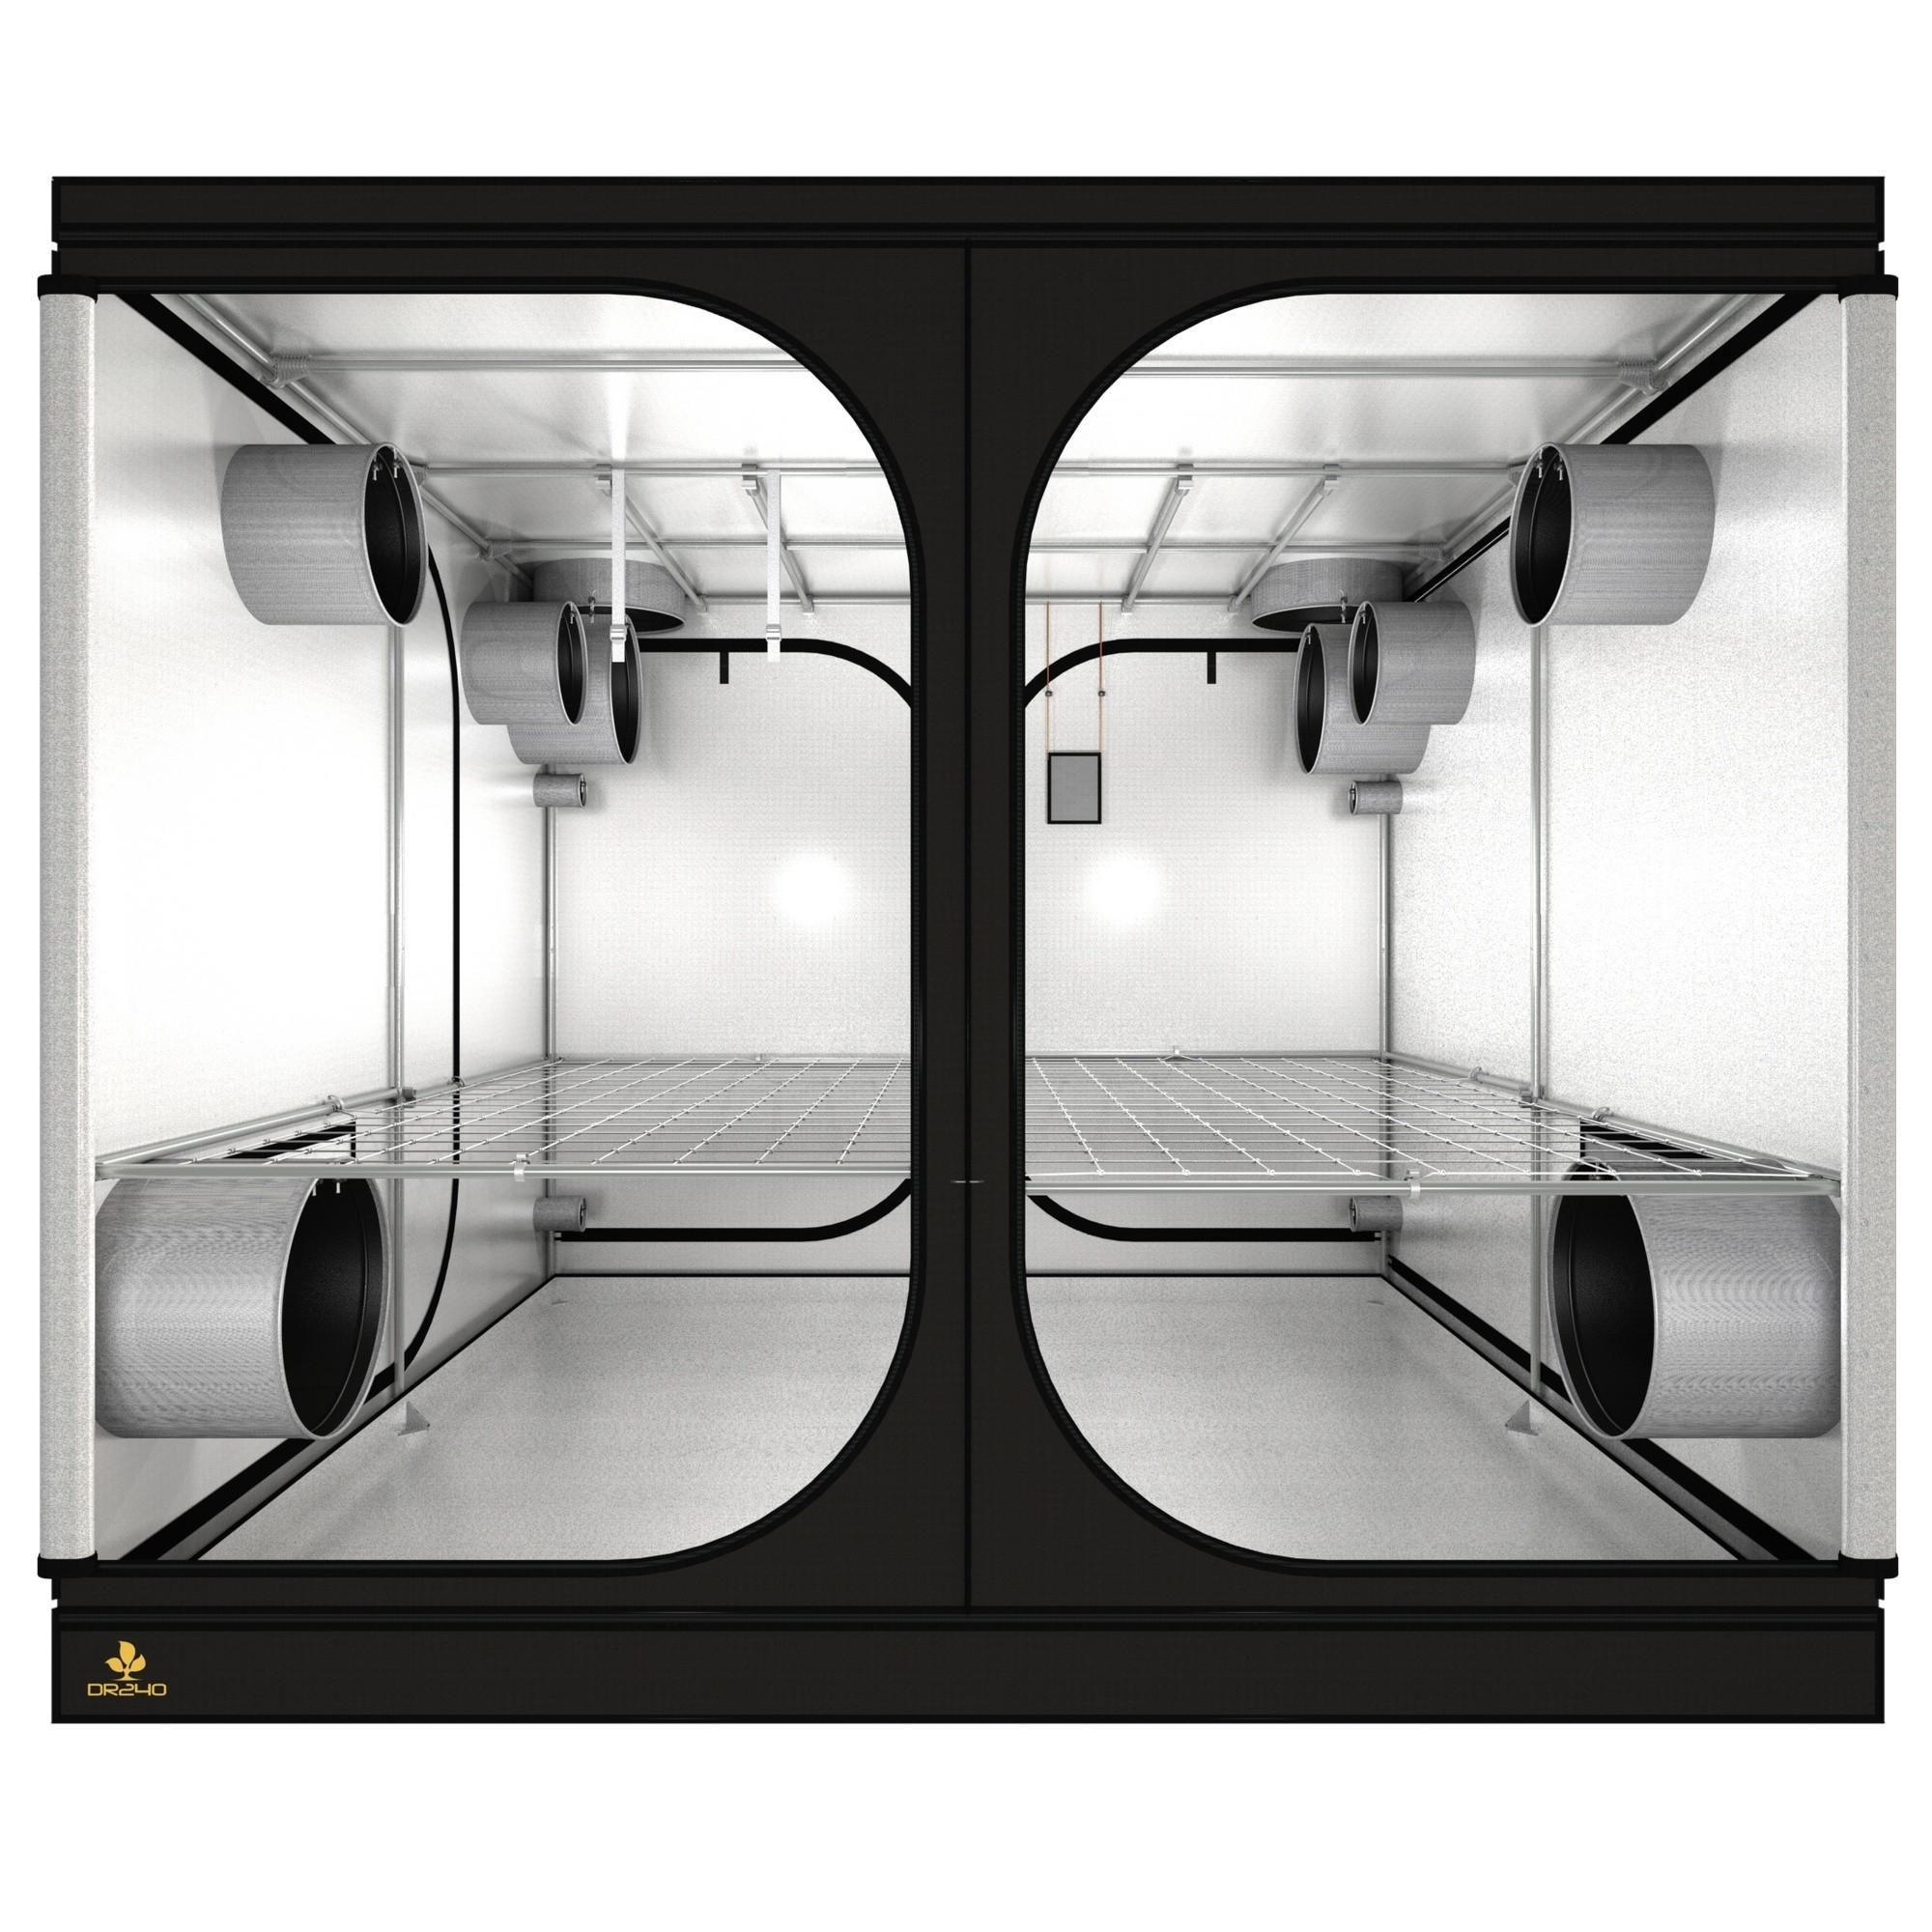 Secret Jardin Dark Room R3.00 240x240x200 см. (гроубокс для выращивания растений)